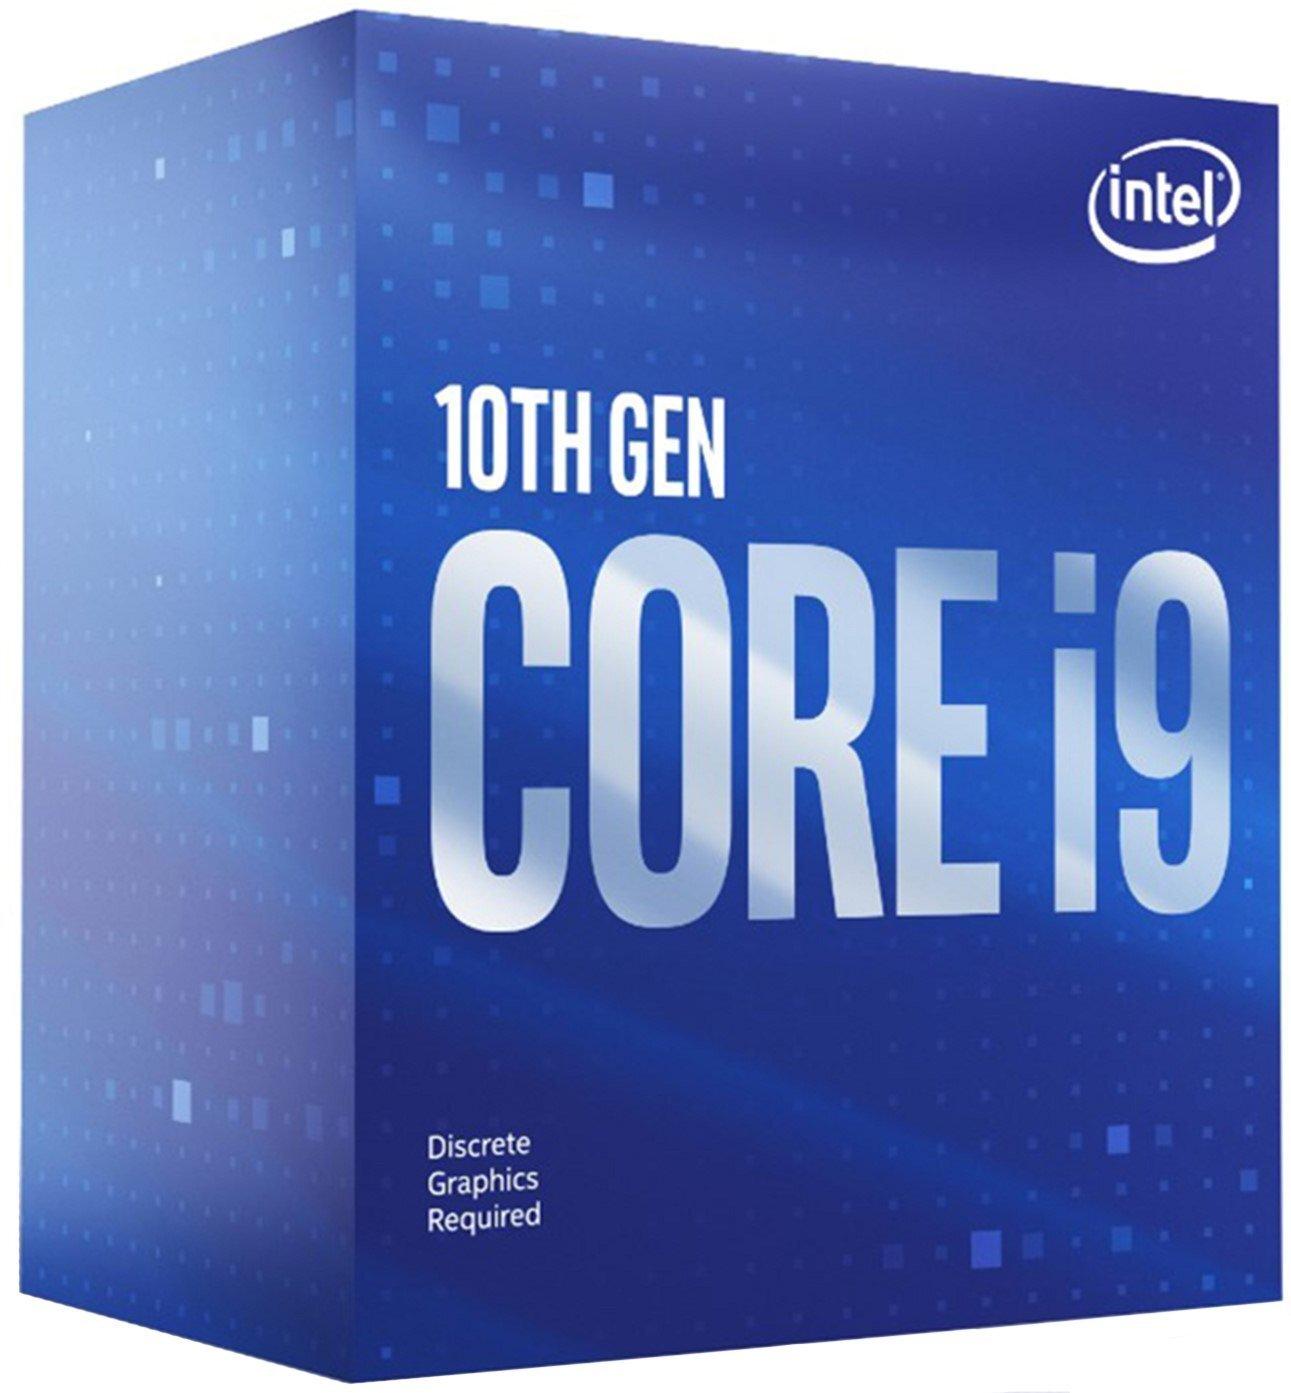 Процесор Intel Core i9-10900 10/20 2.8GHz 20M LGA1200 65W box (BX8070110900) фото1